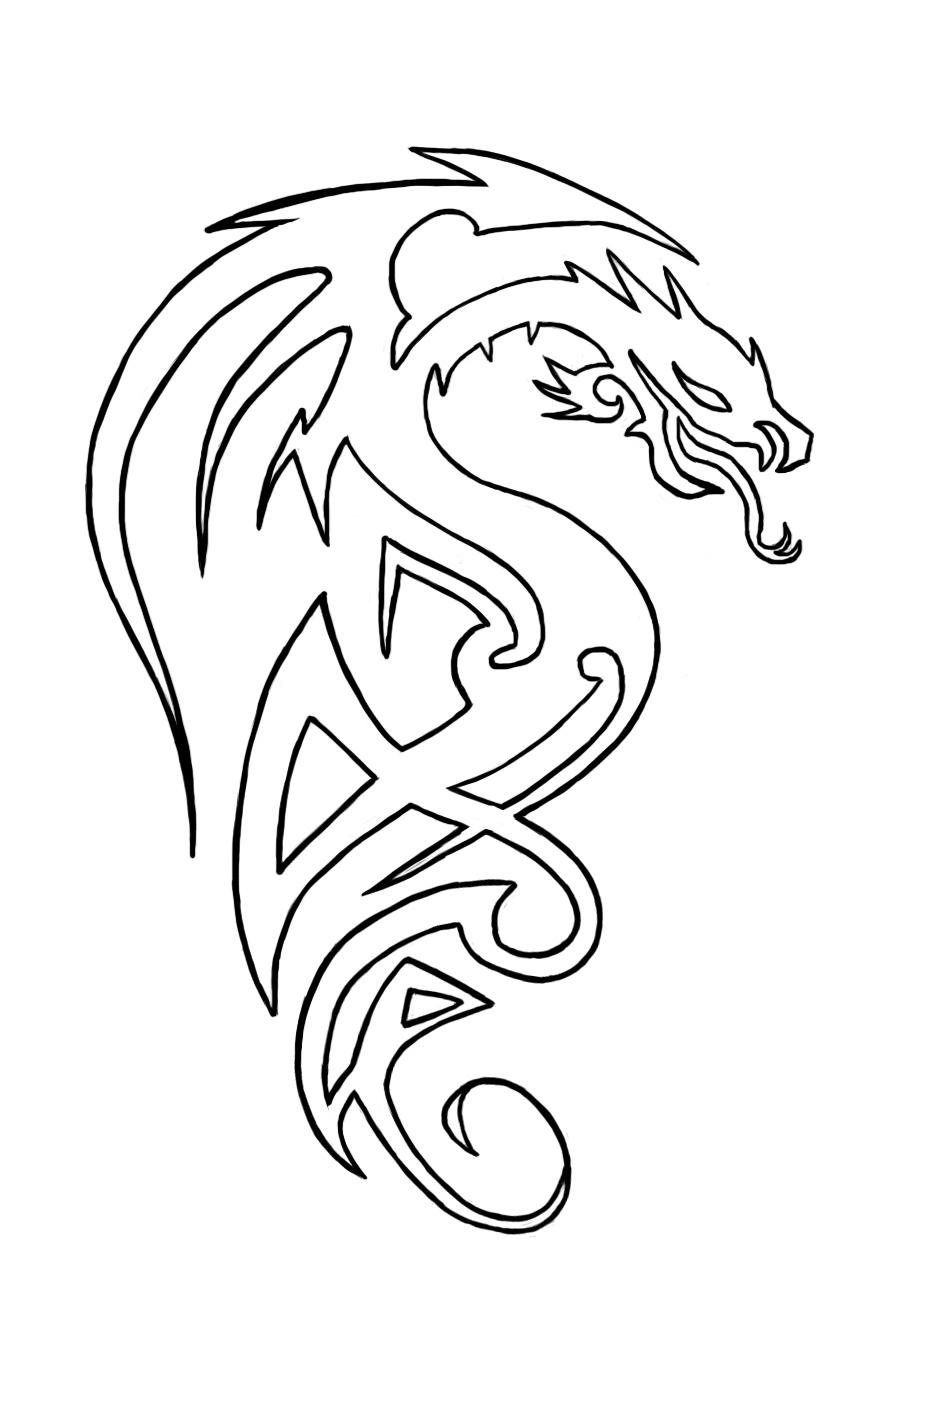 Dragon - tattoo design